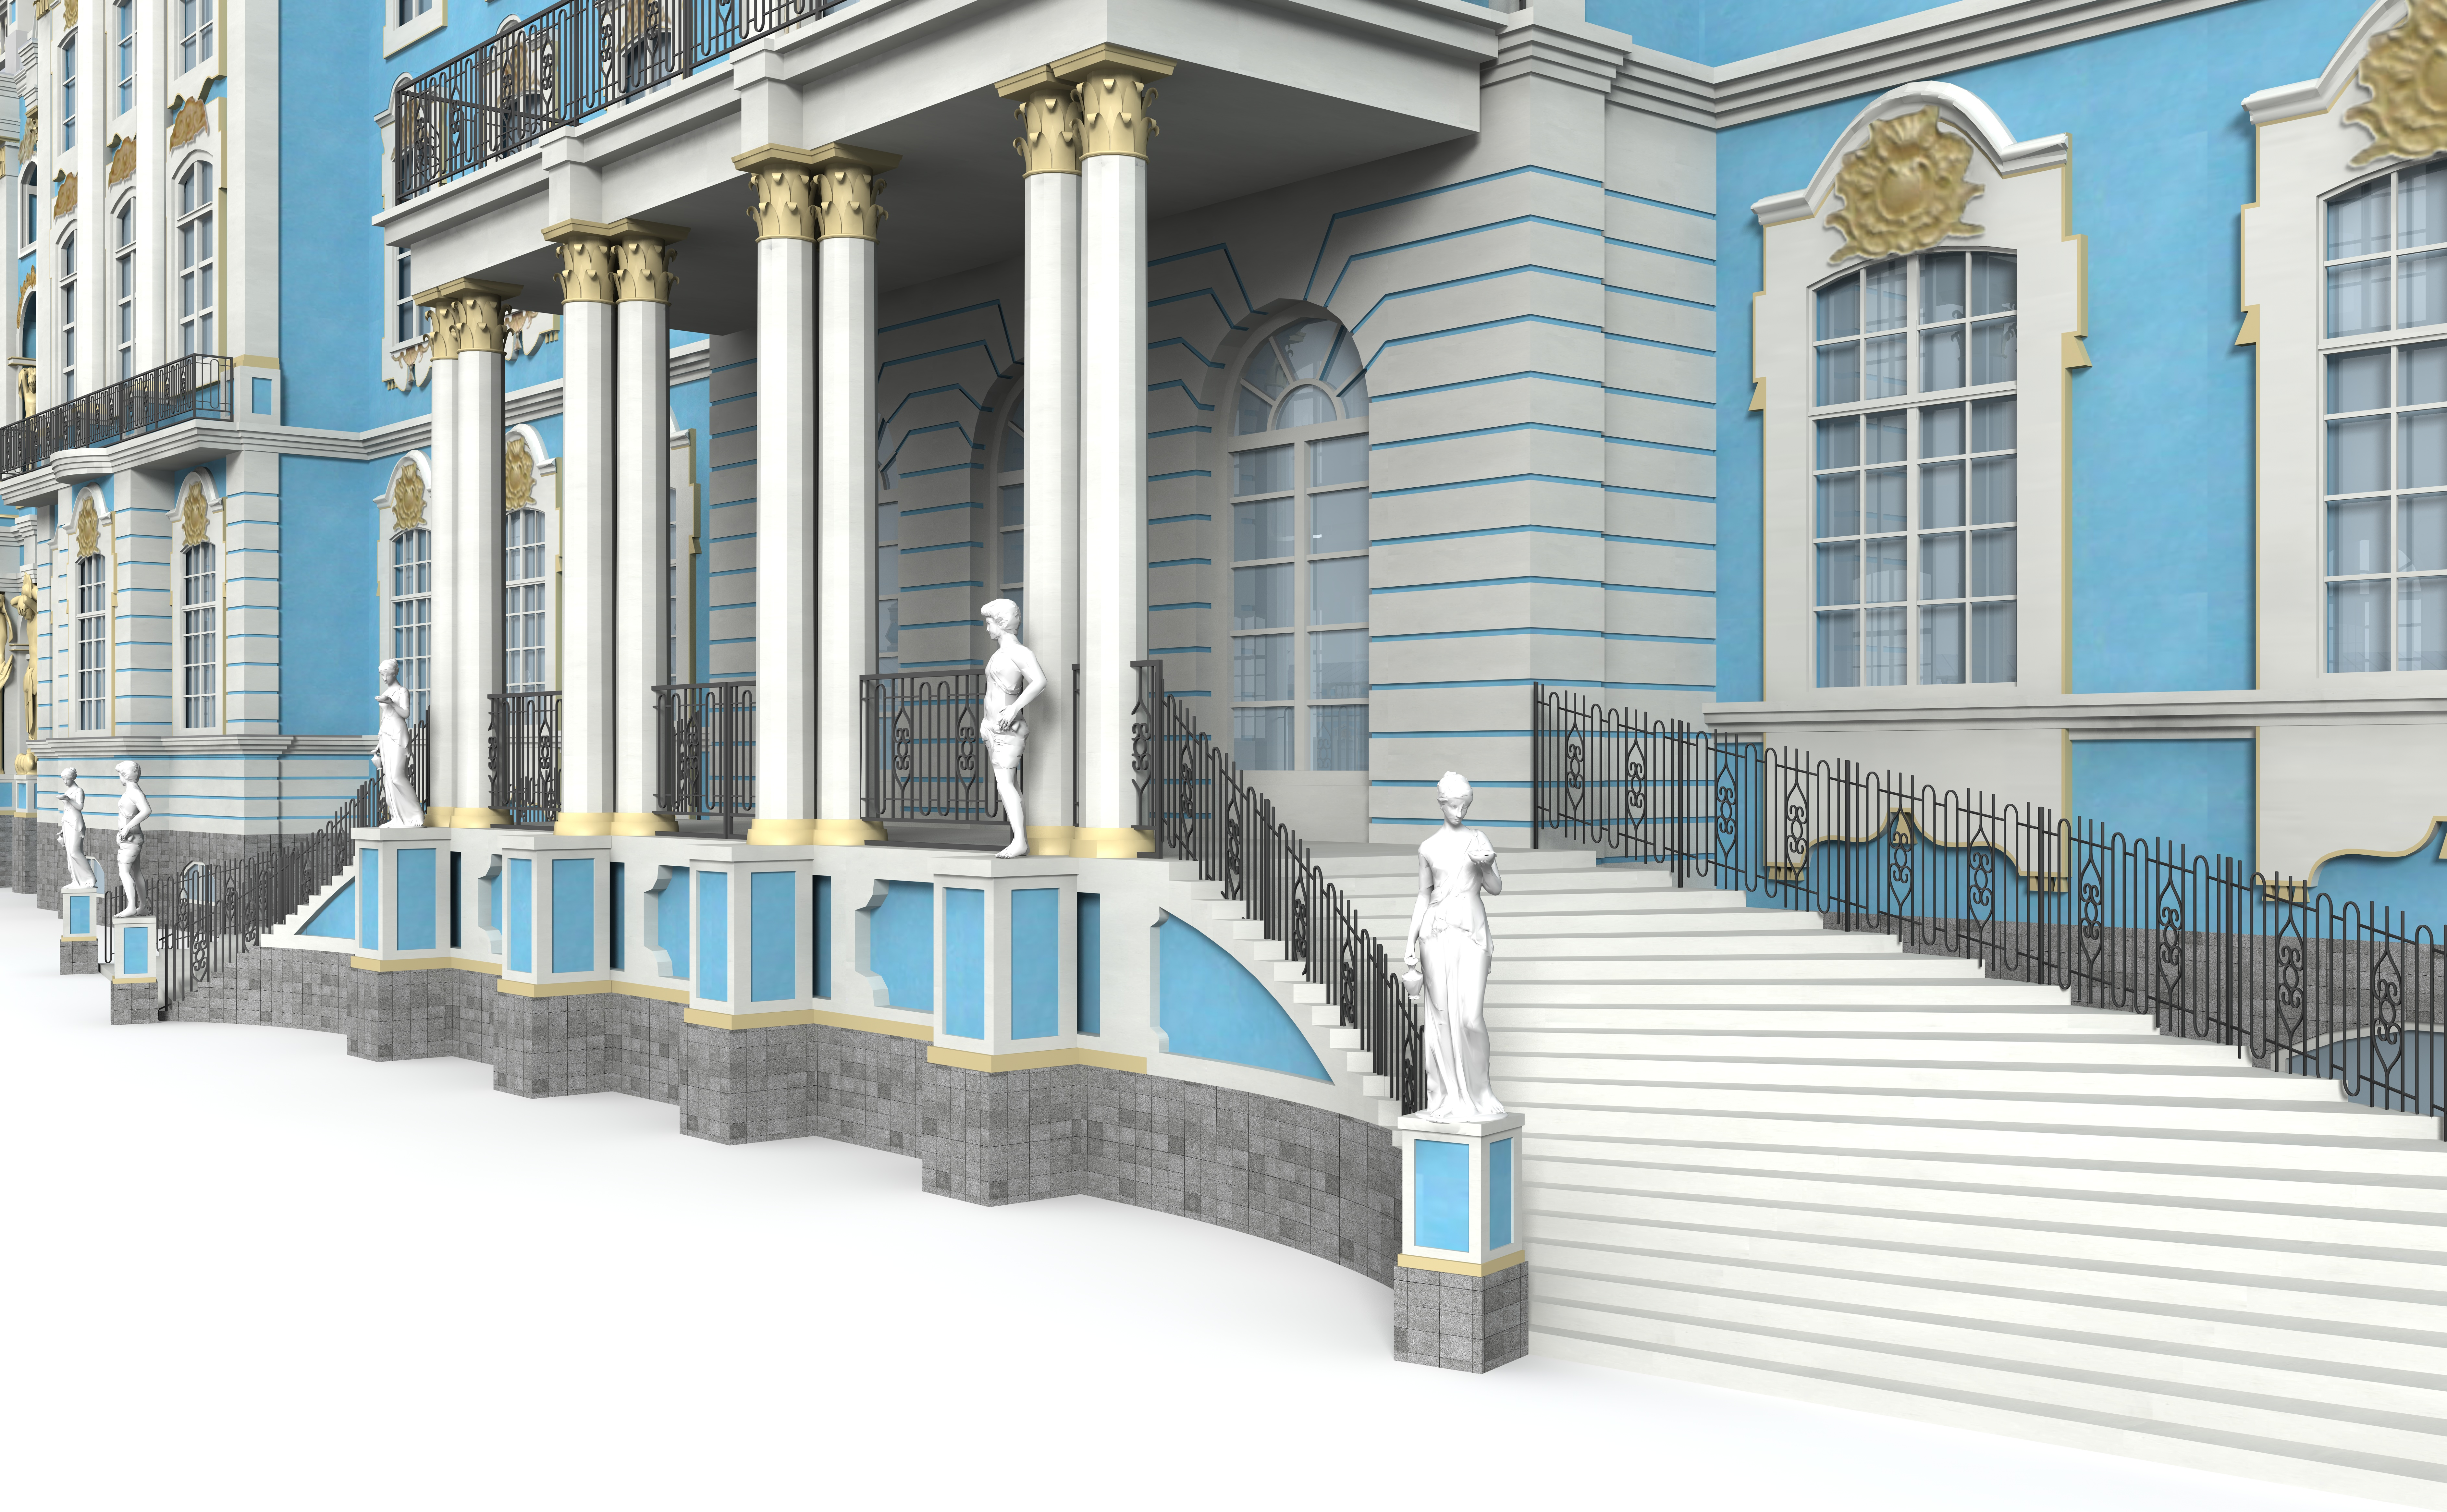 покупку дворец екатерина на фонтанке прилагаемое Типовое